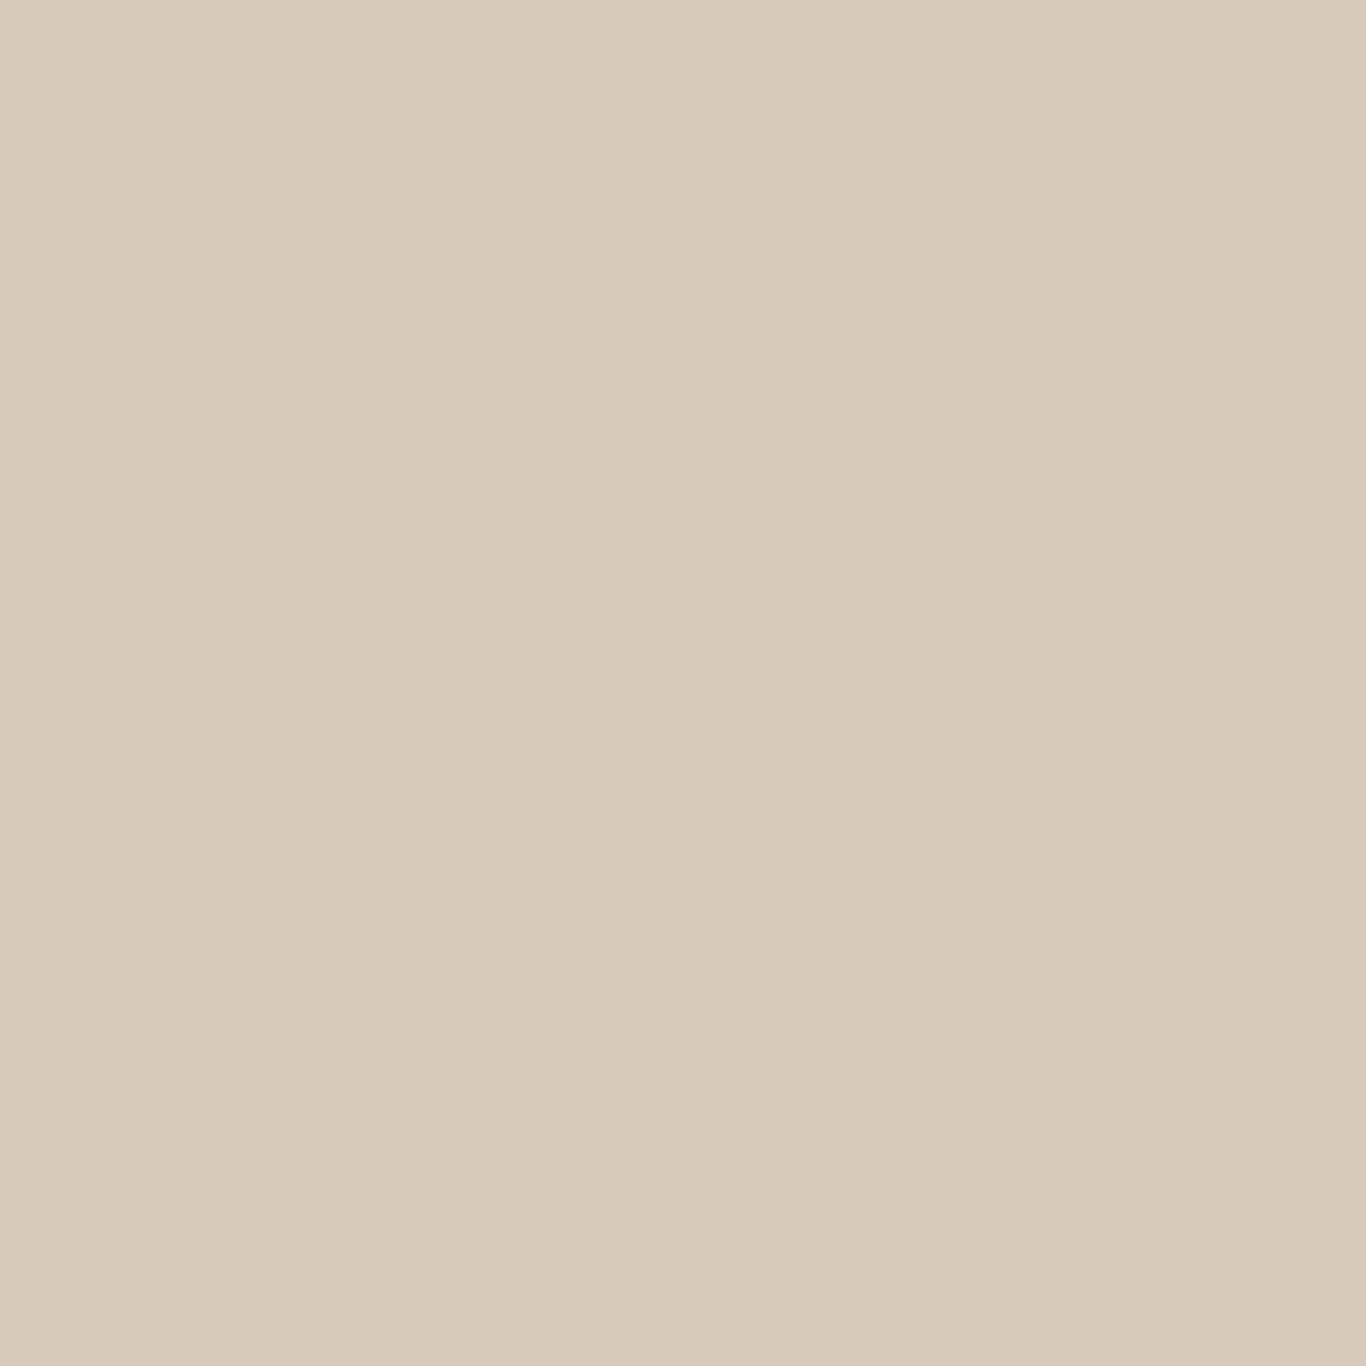 Sanderson Paint Mushroom Grey Light